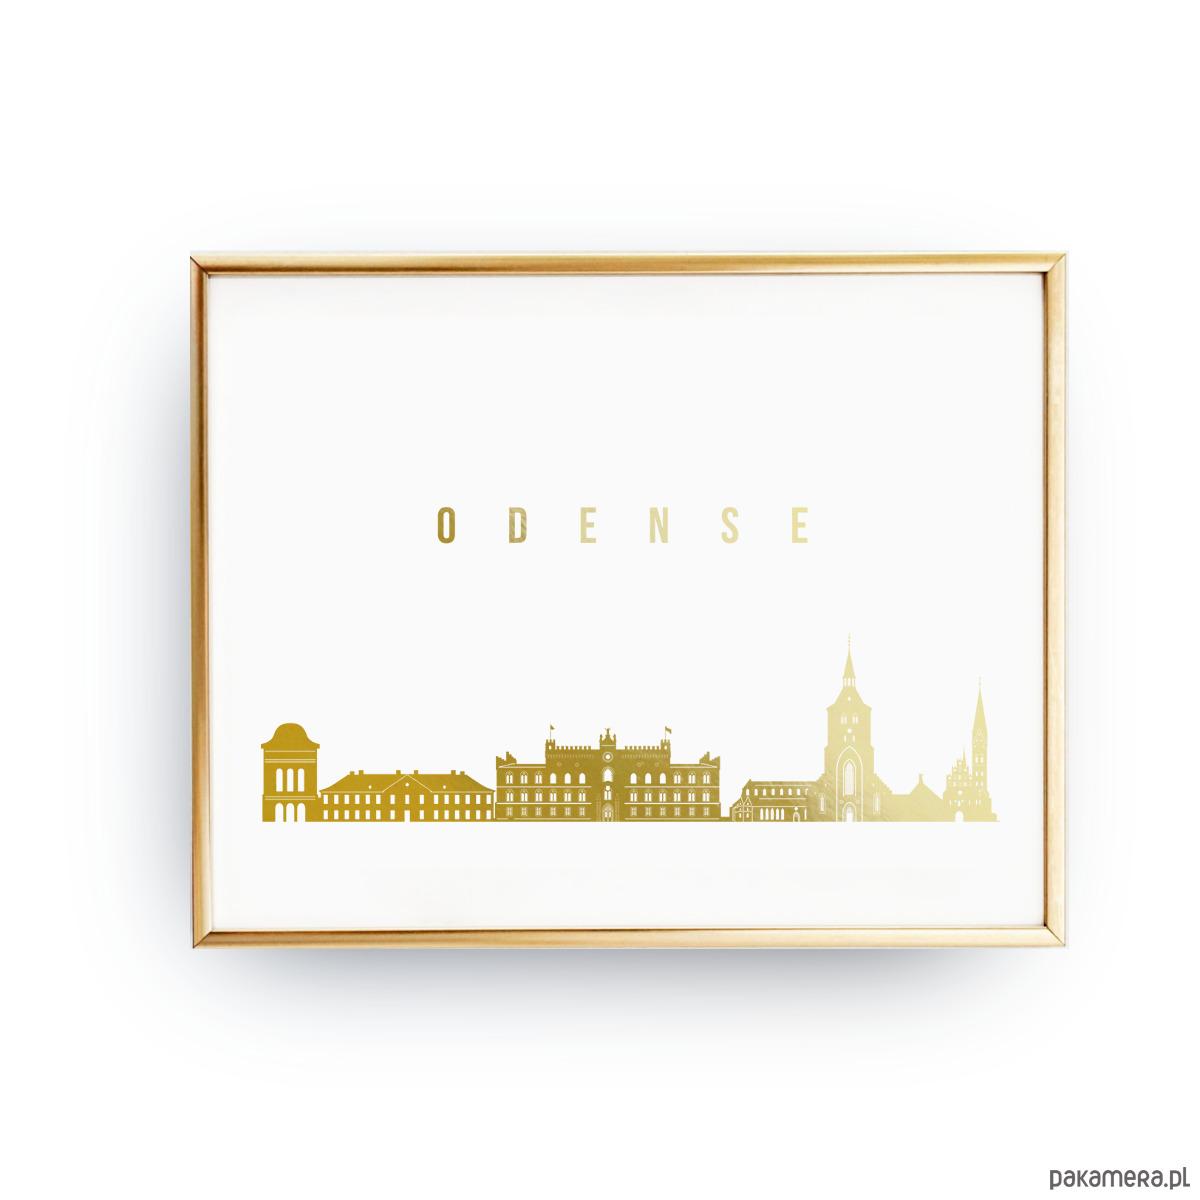 Plakat Odense Złoty Druk Pakamerapl